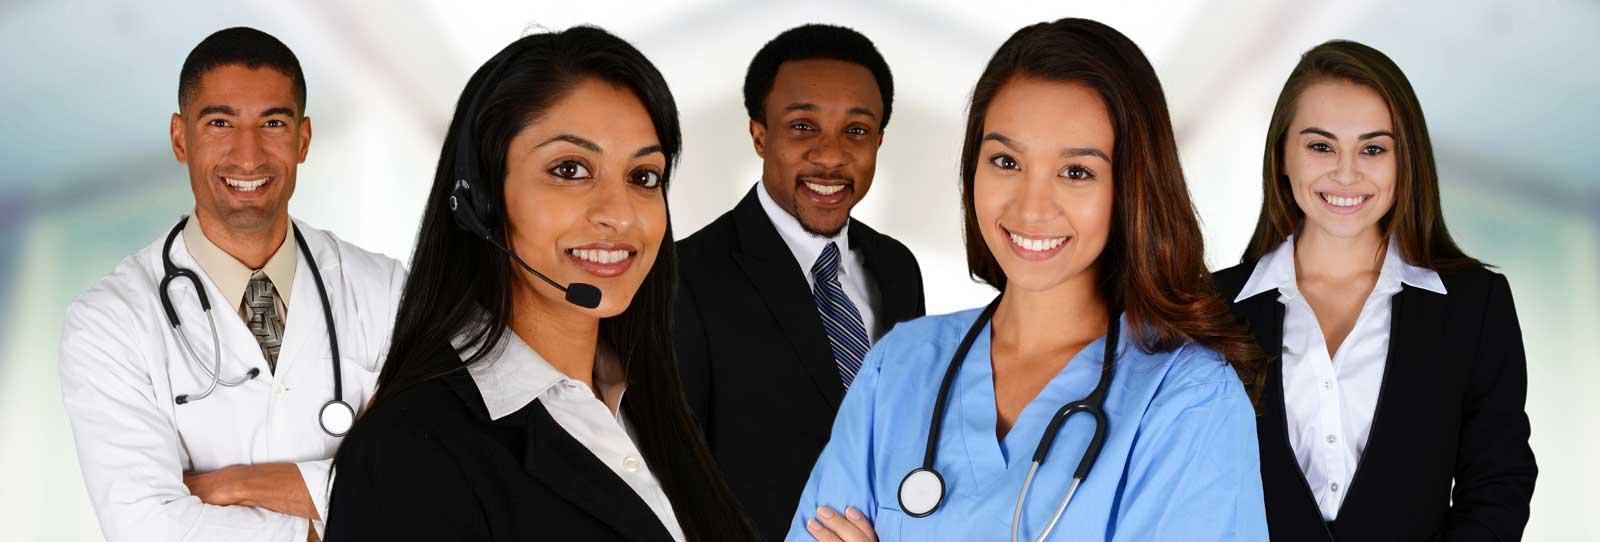 health-professionals